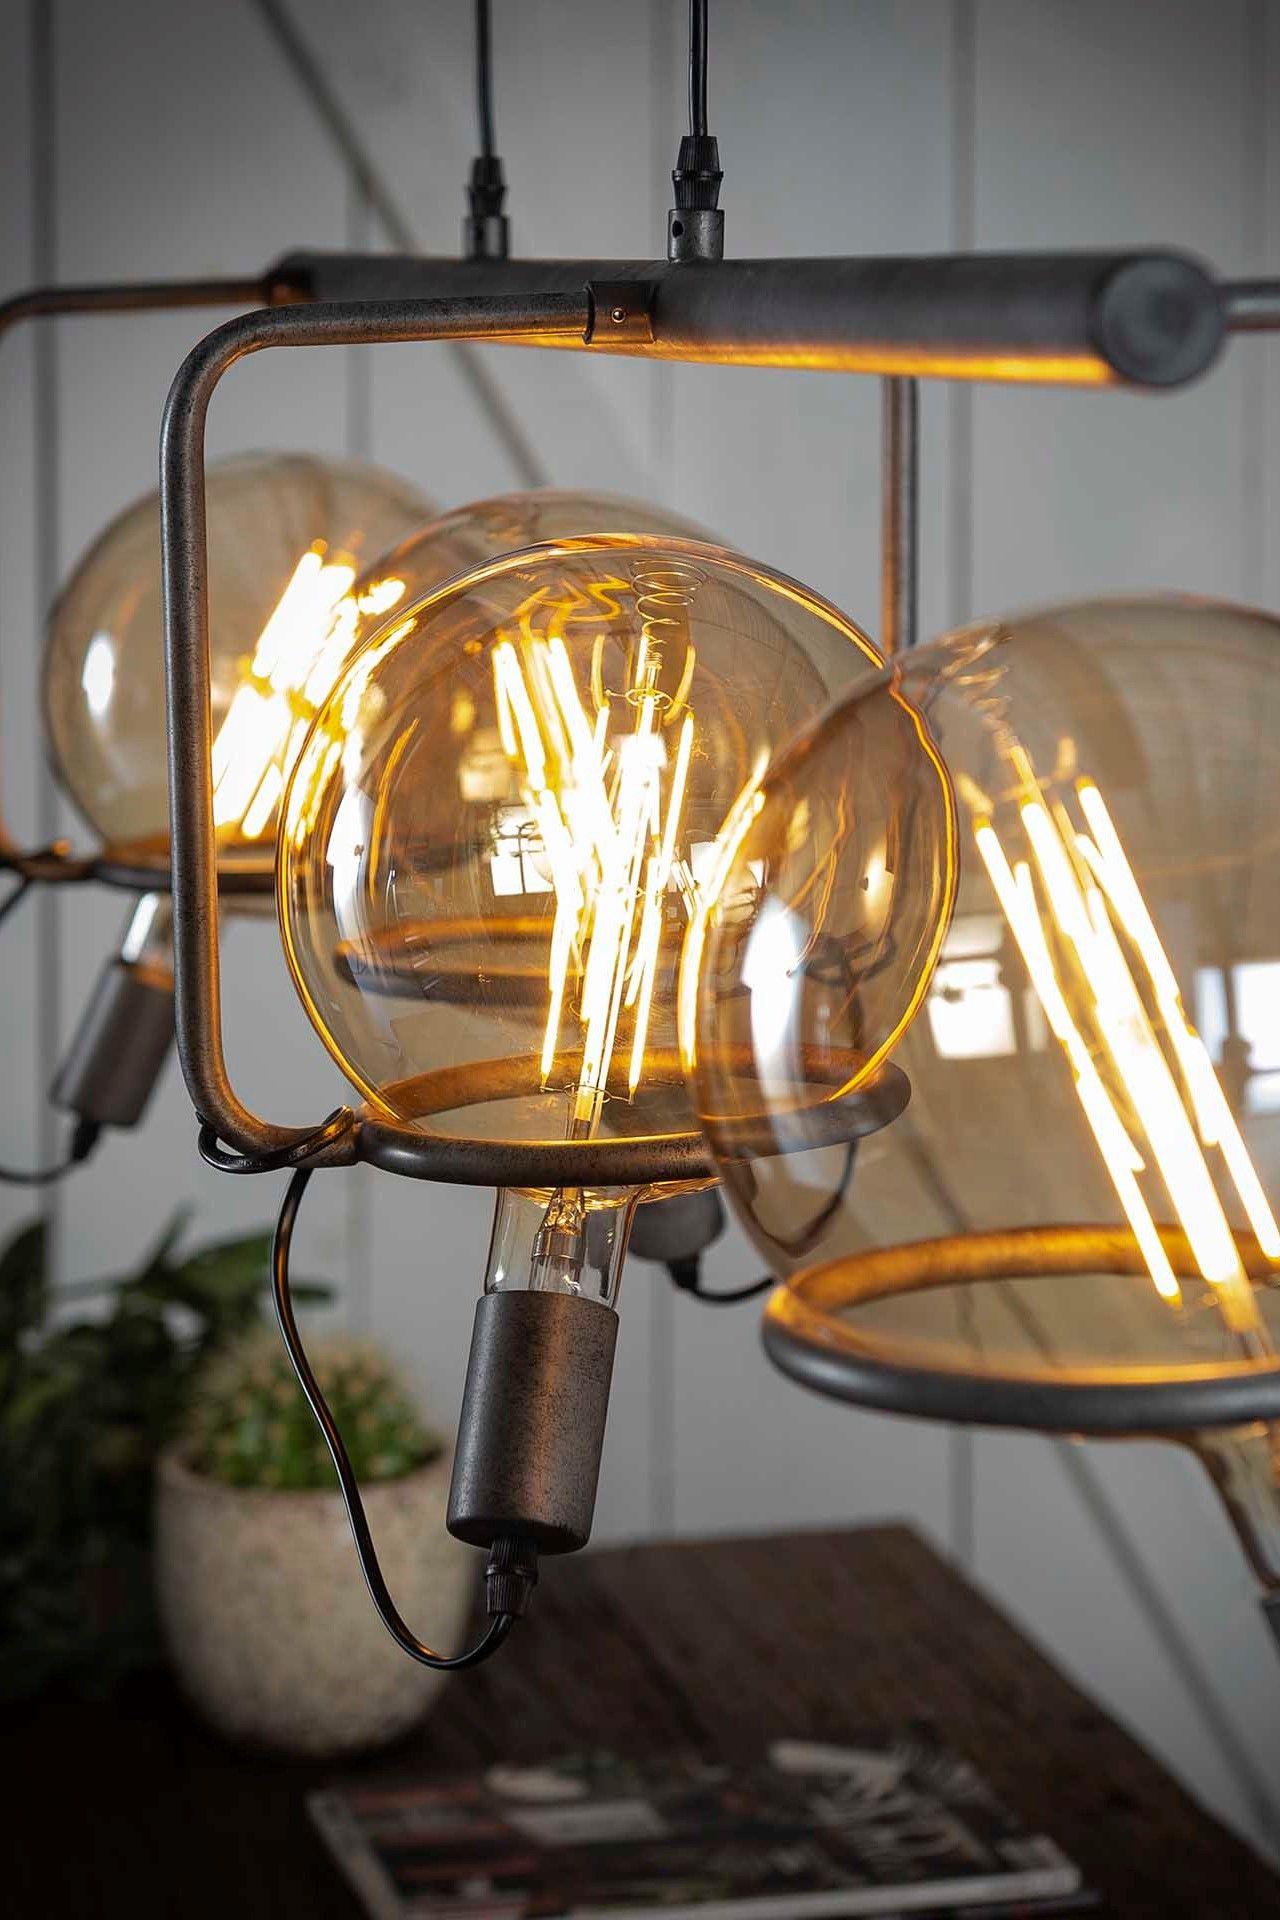 Pin Von Rihards Aigars Auf Lamps Lampe Coole Lampen Design Lampen